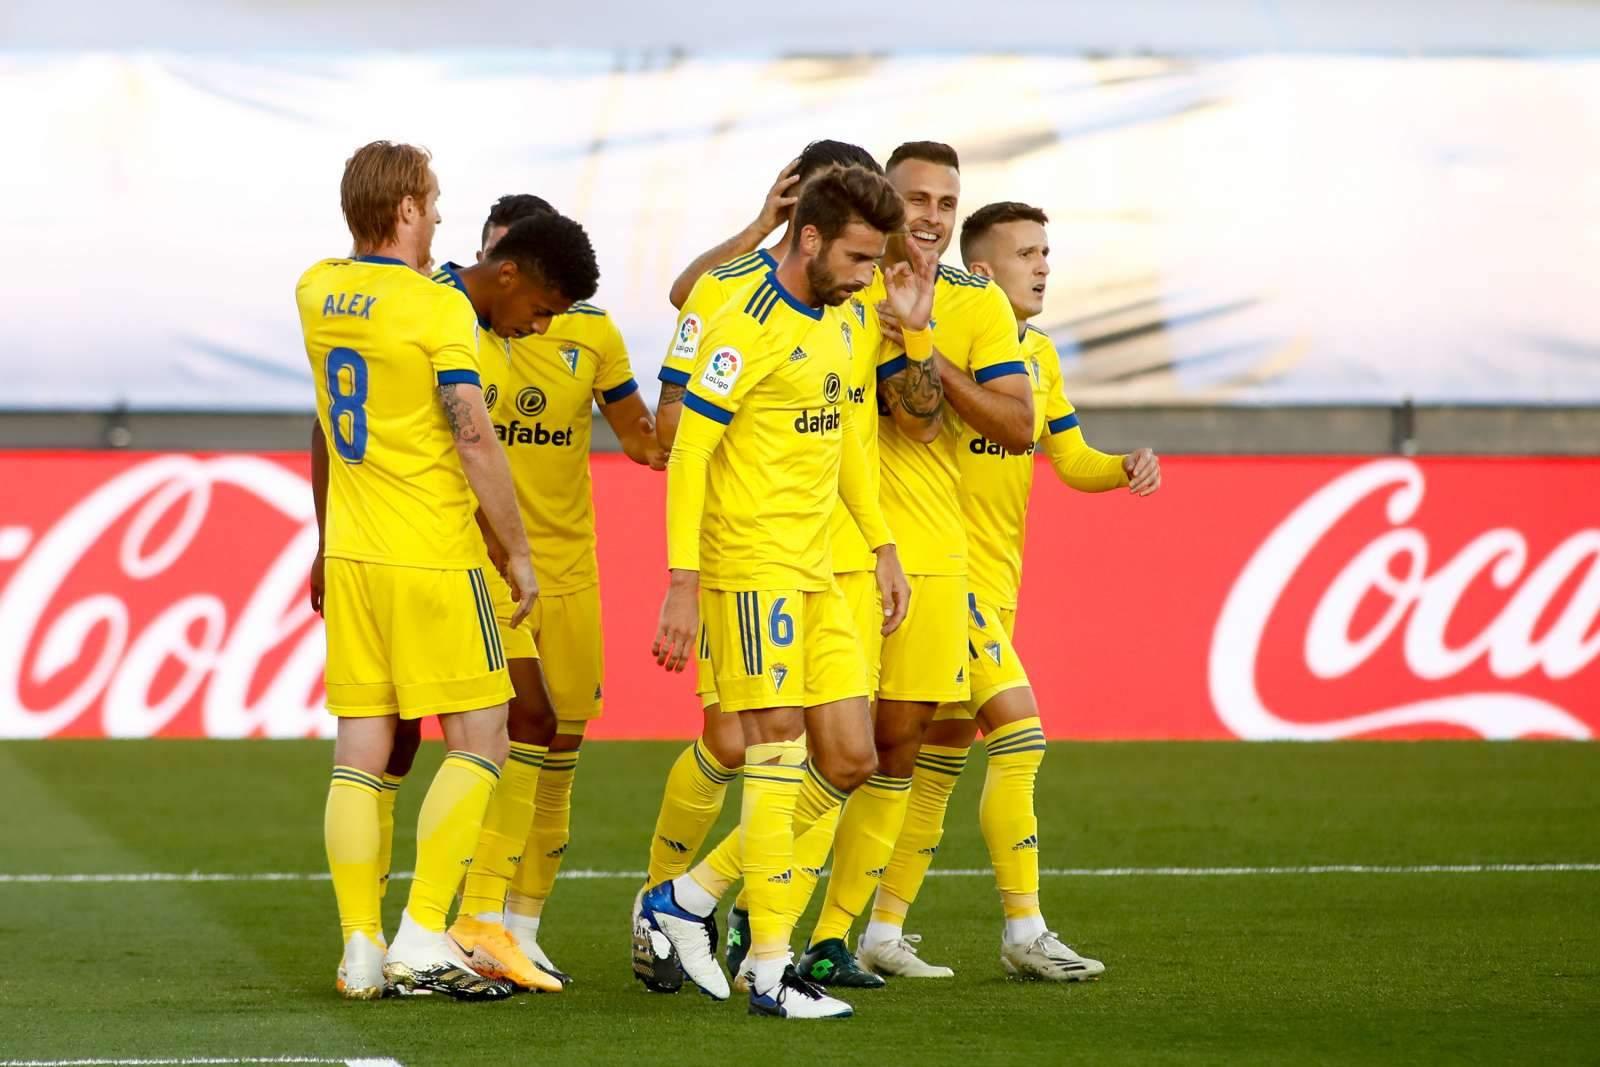 Игроки «Кадиса» на матче с «Реалом» поучаствуют в акции против Суперлиги